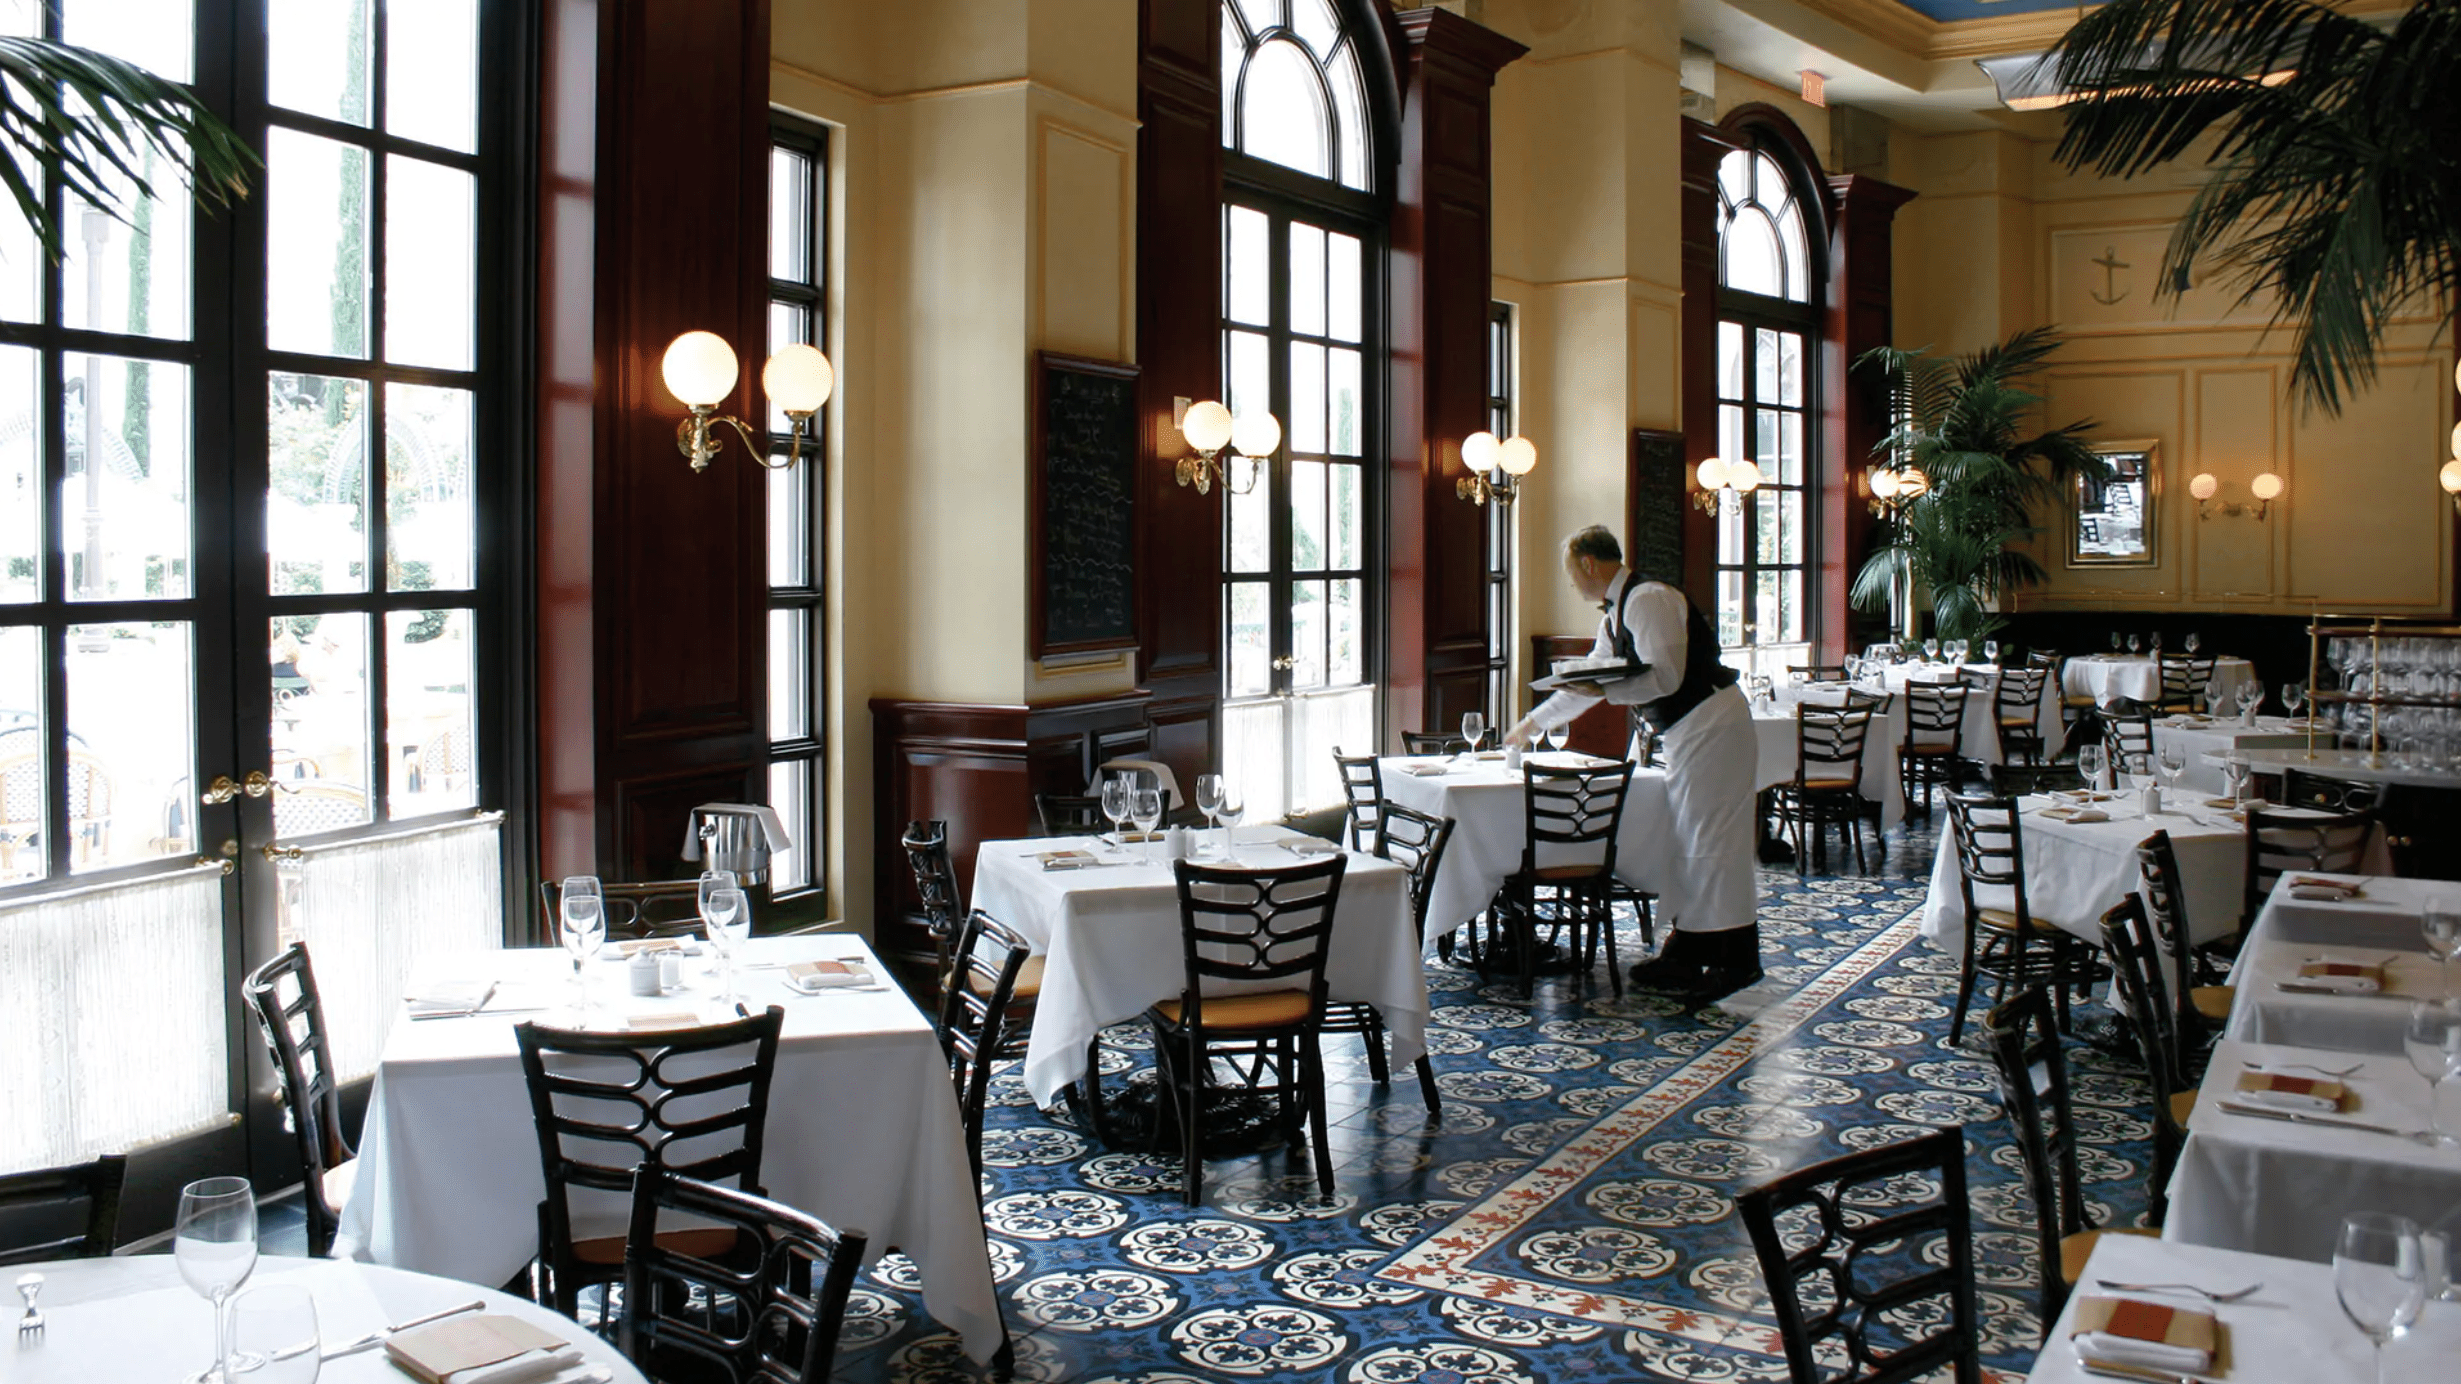 waiter setting a table in the Bouchon restaurant in the Venetian Las Vegas resort